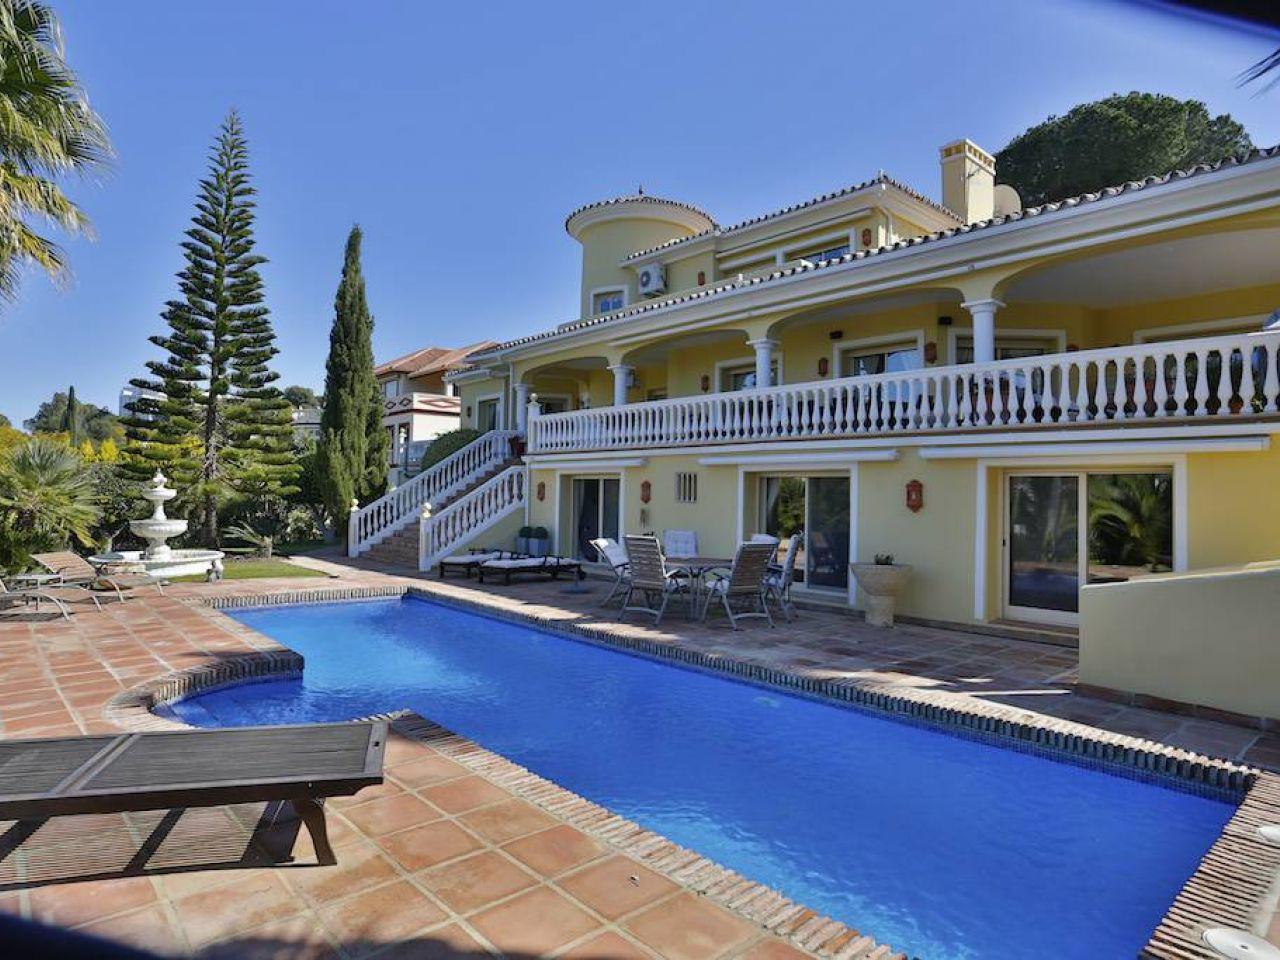 Single Family Home for Sale at Fantastic family property el Paraiso Medio Estepona, Andalucia 29680 Spain